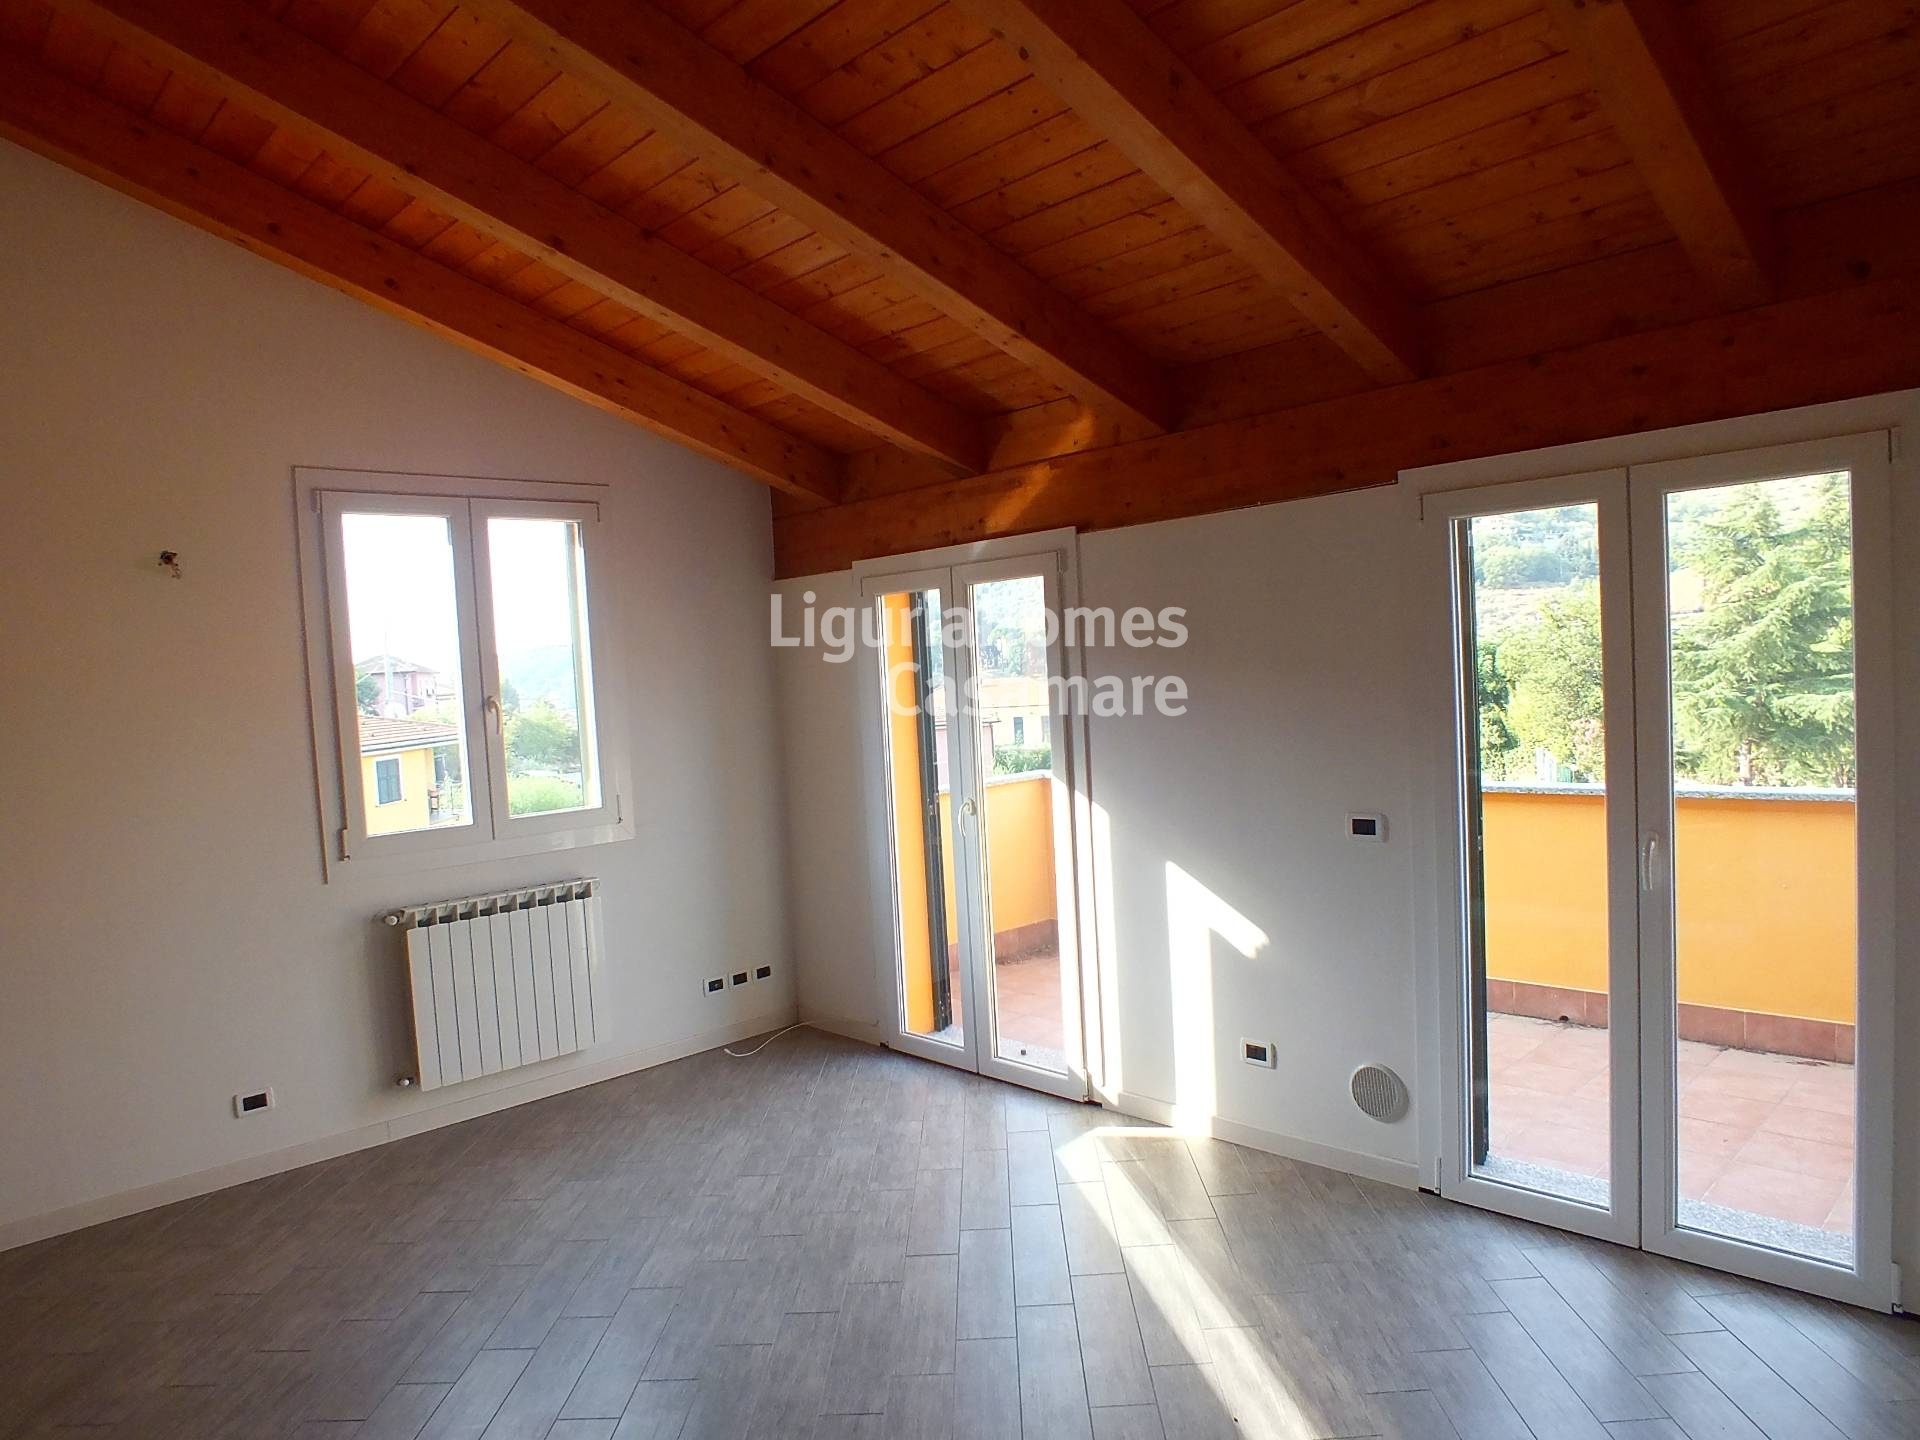 Apartment for Sale in Imperia Ref 6T57